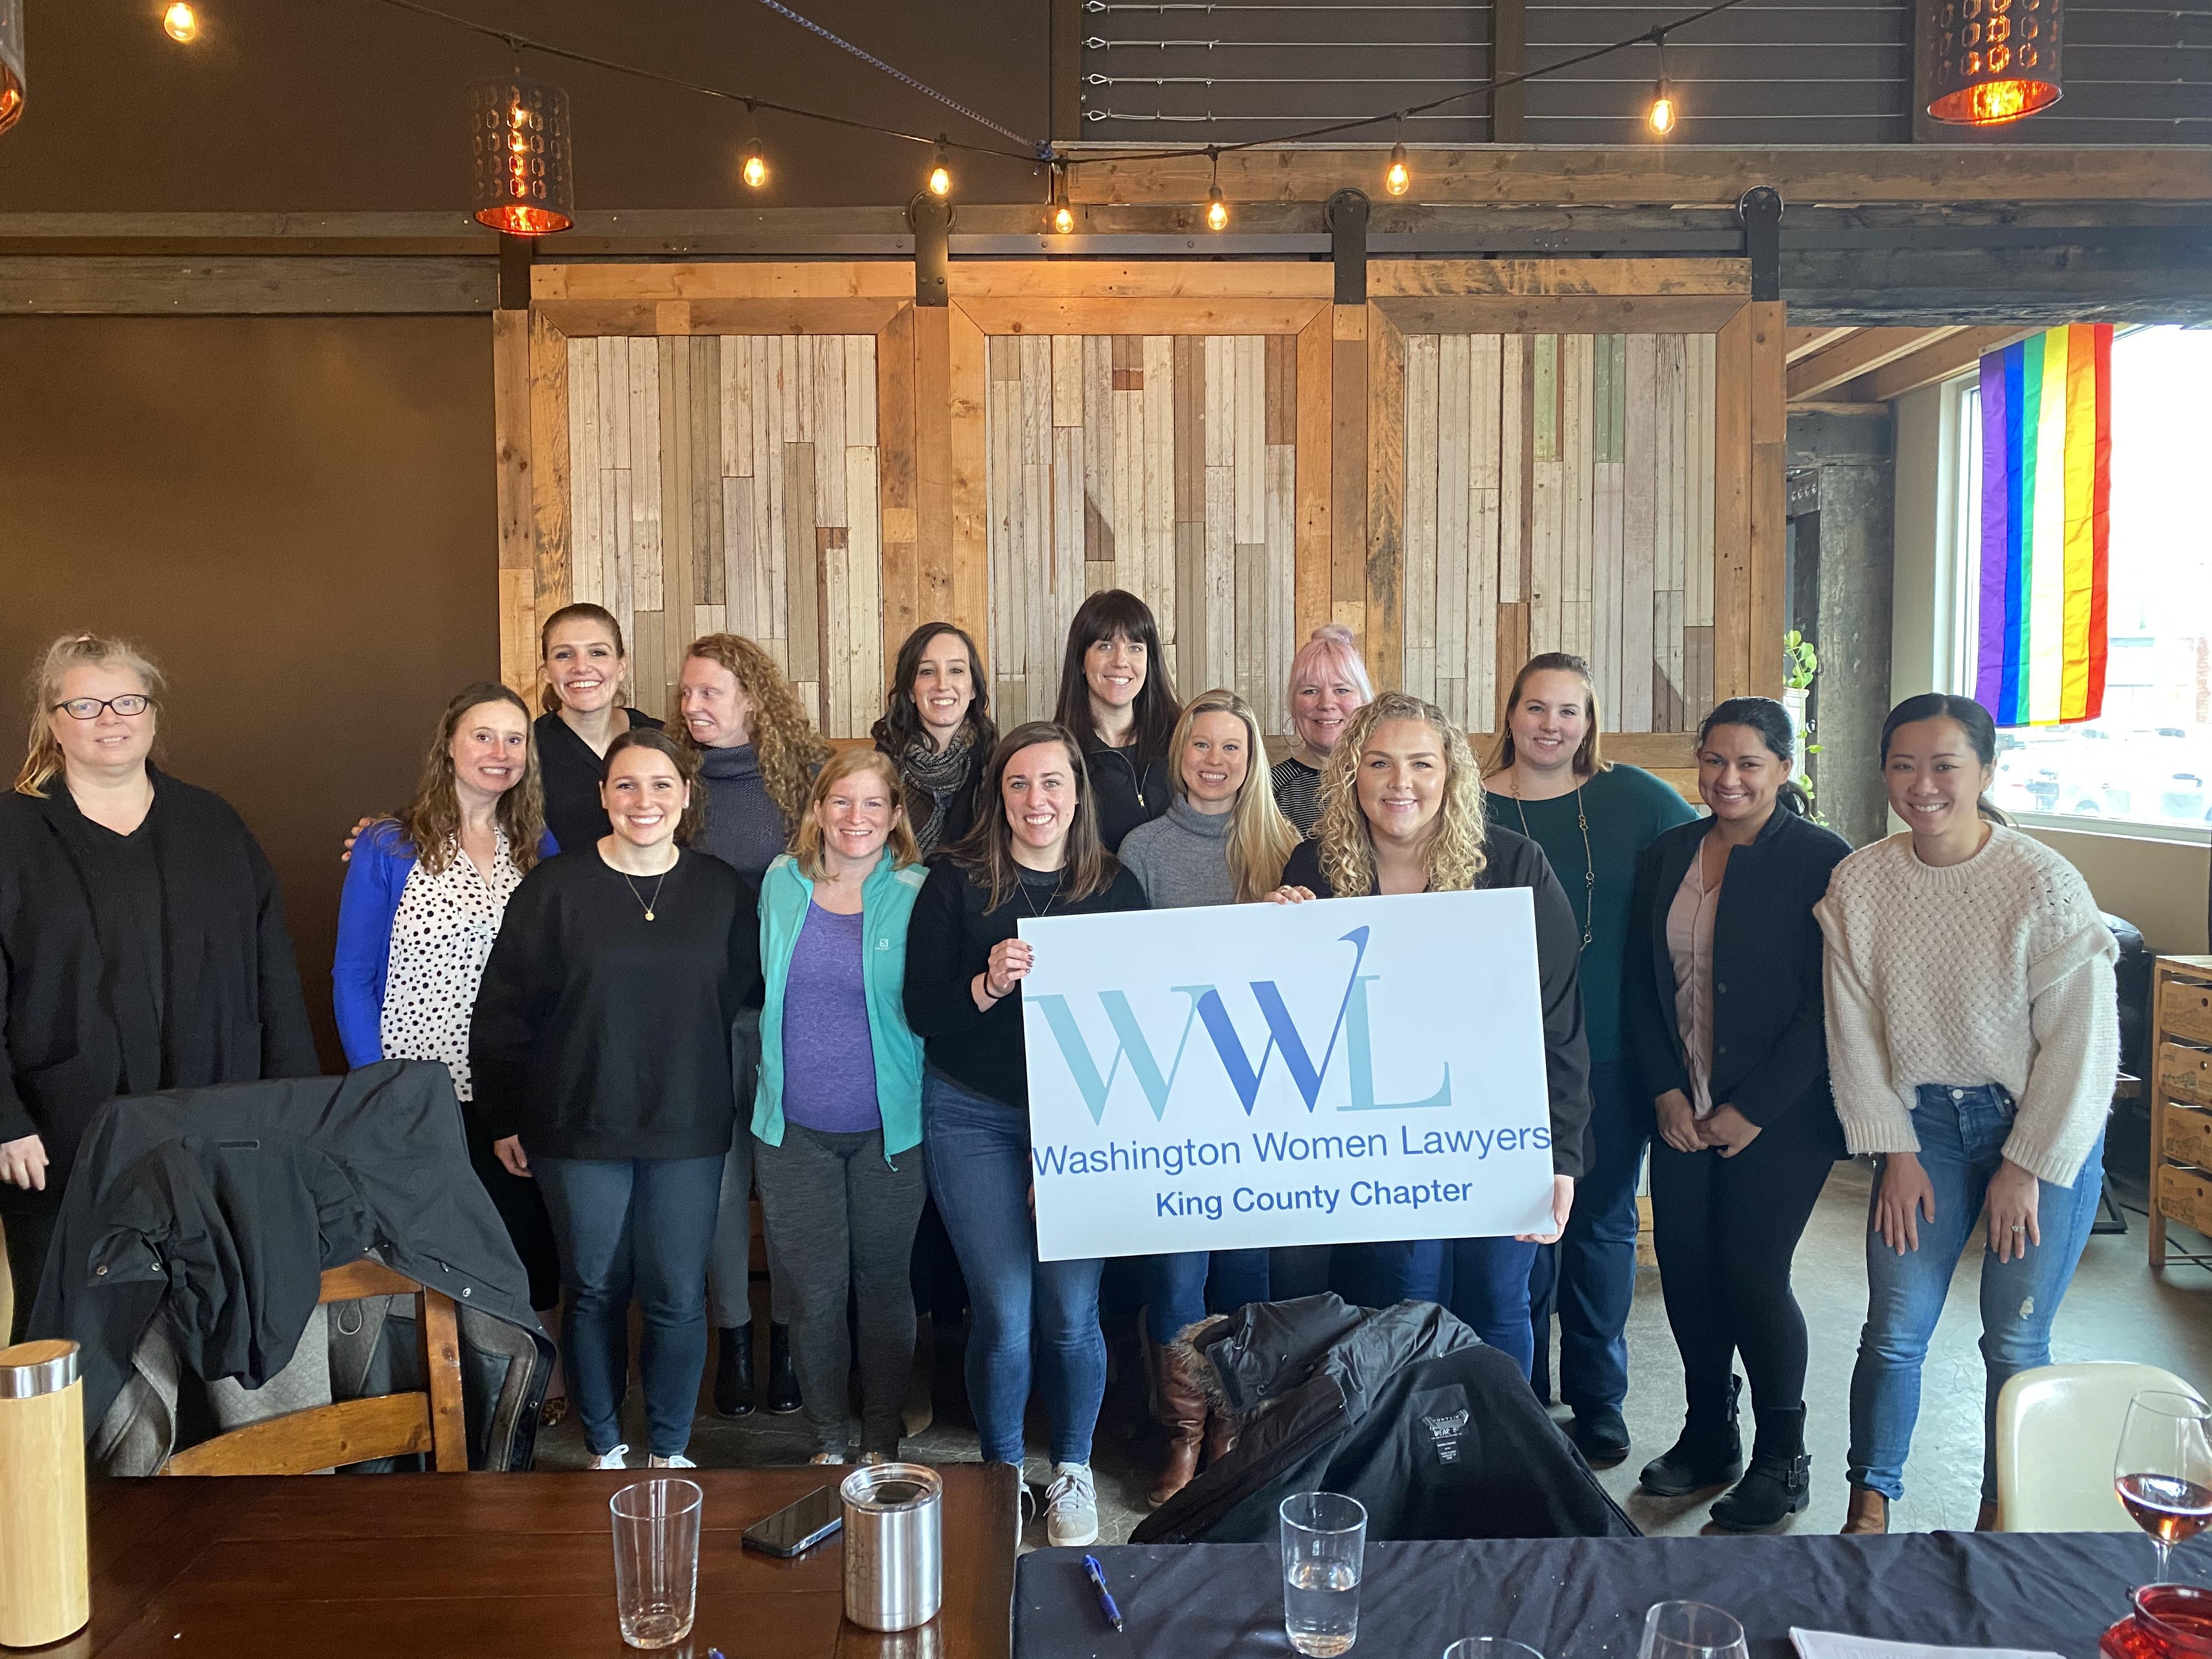 Washington Women Lawyers